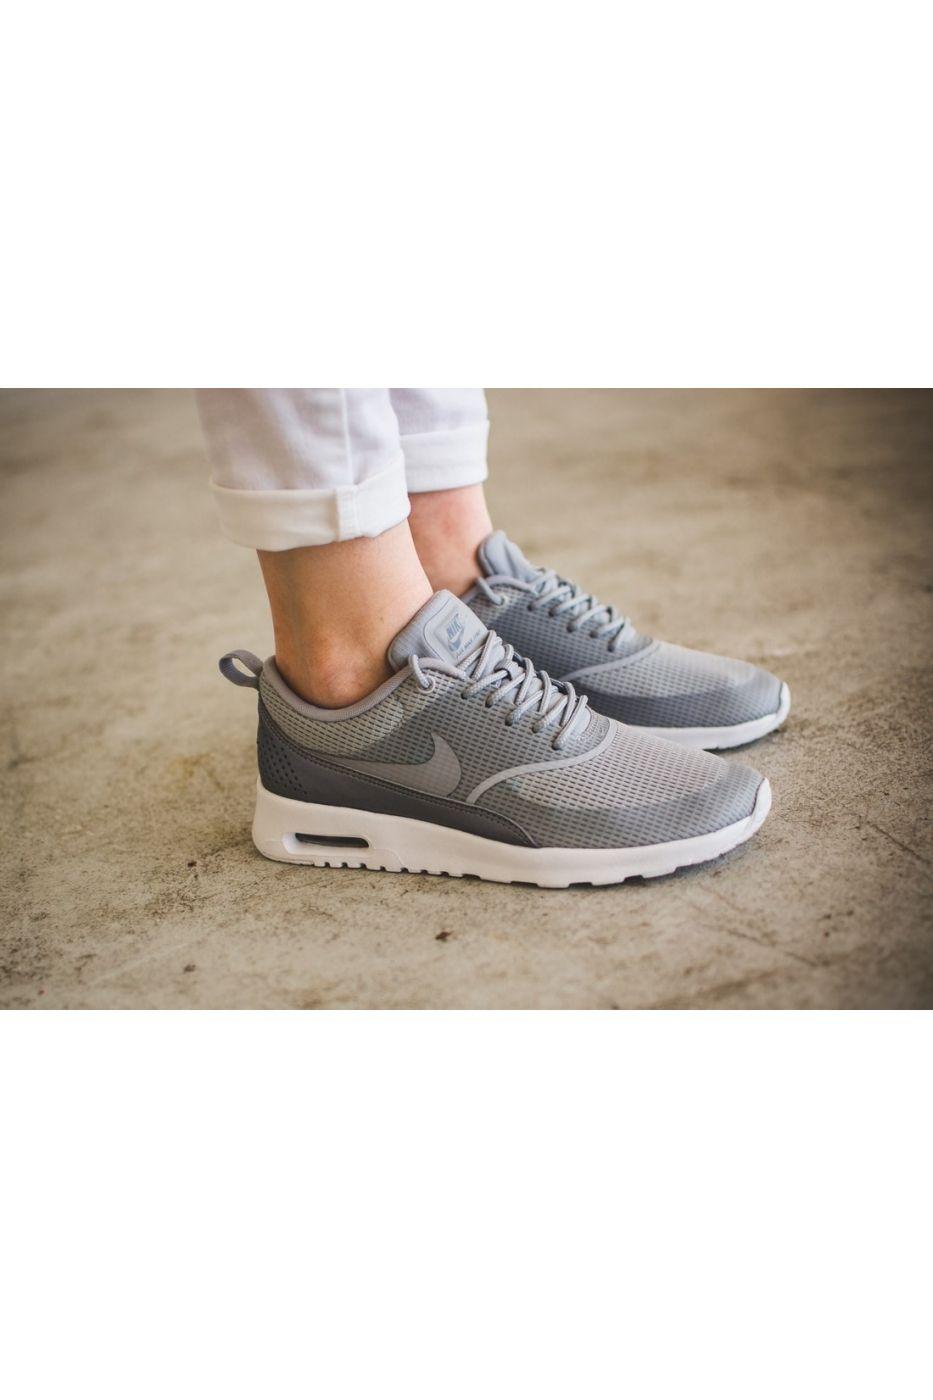 Pantofi sport pentru femei Nike Air Max Thea Wmns Outfit ideas